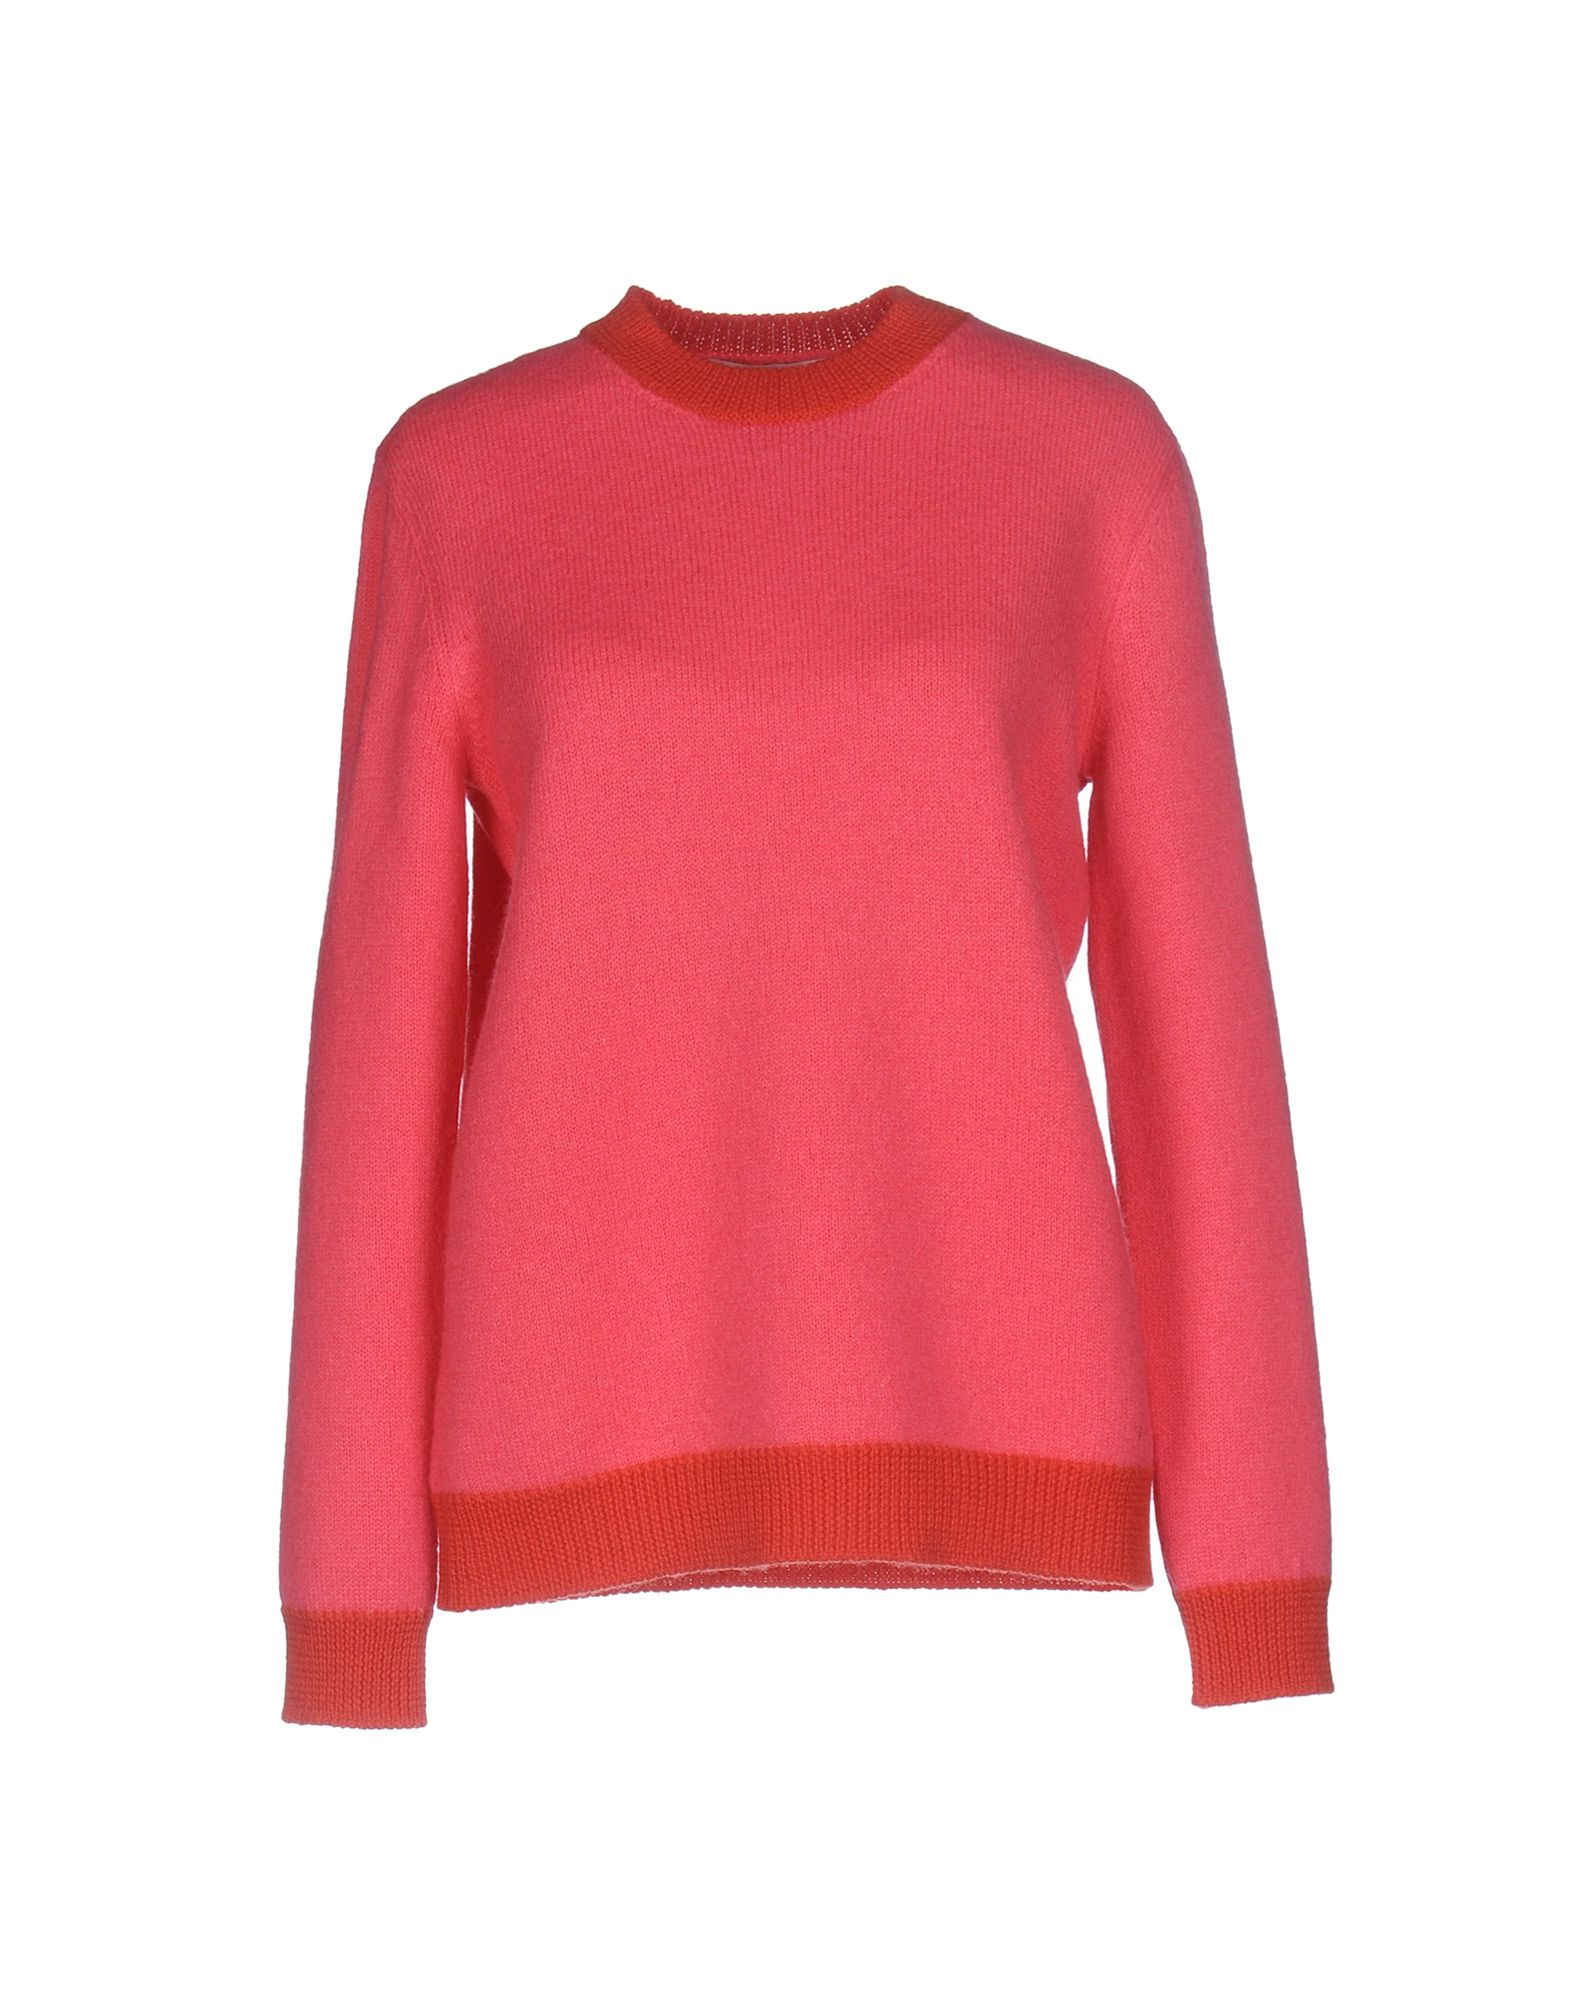 Pullover Valentino Donna - Acquista online su 5VueLlP0DJ